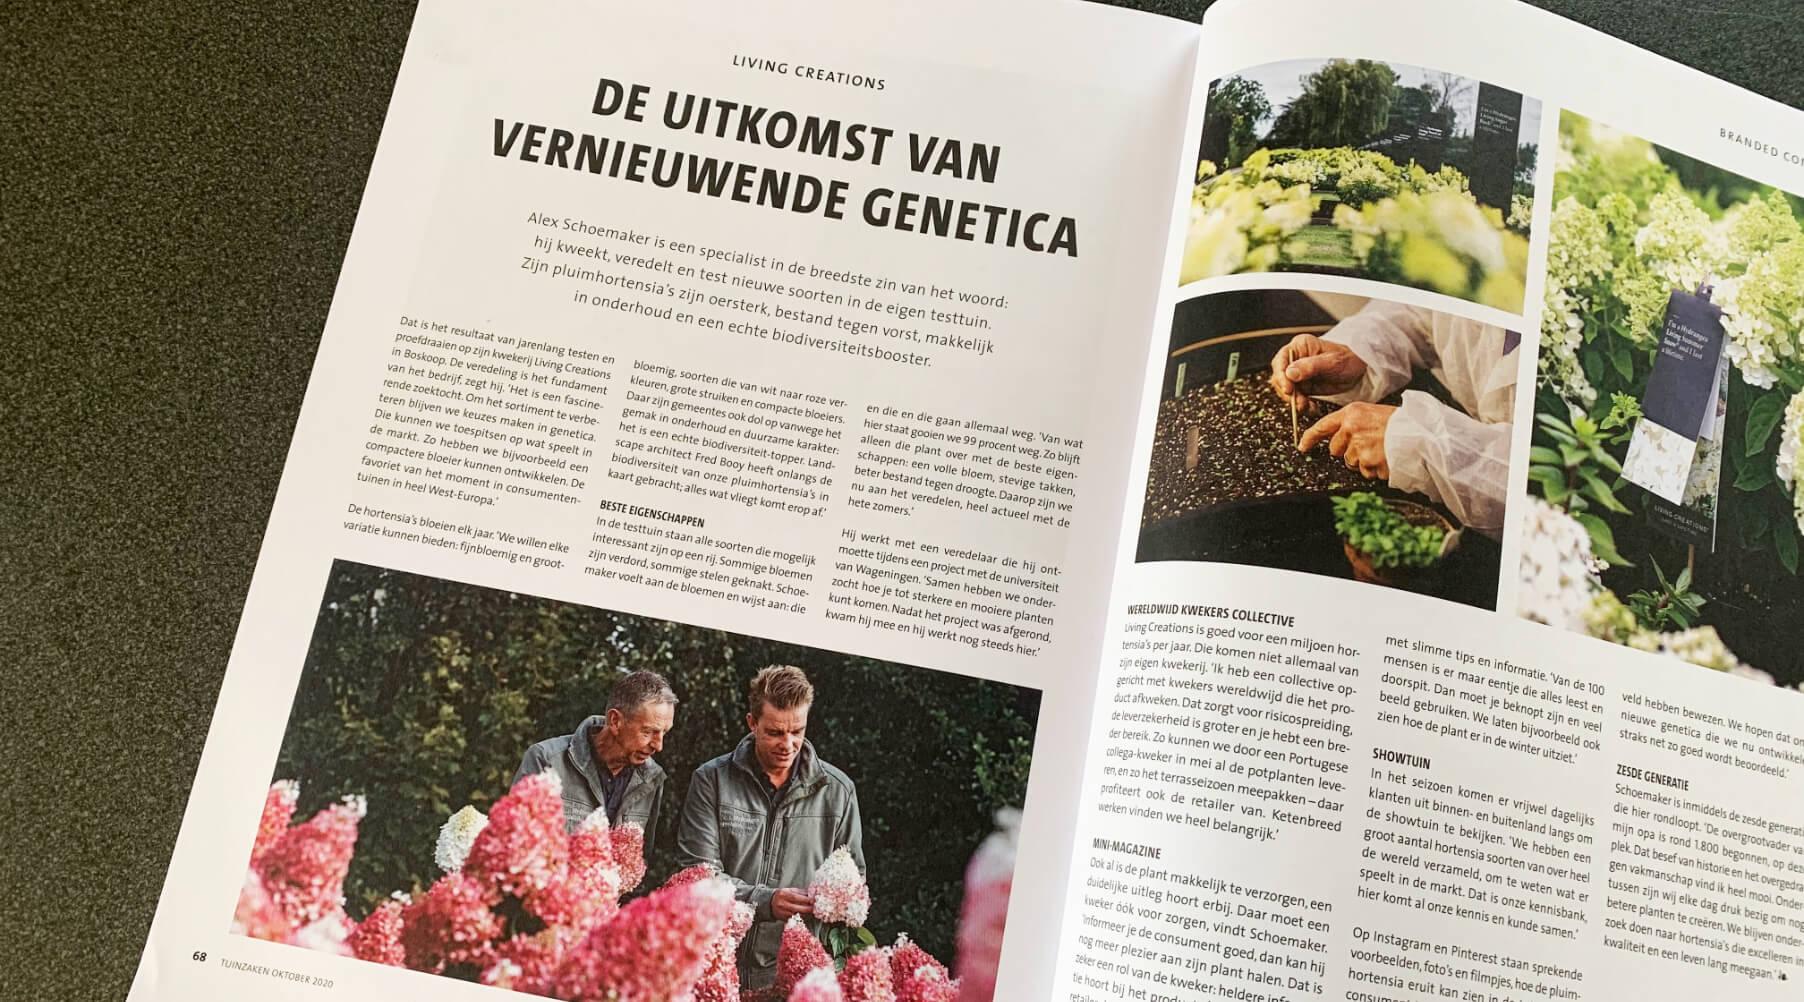 Article Alex Schoemaker in Tuinzaken